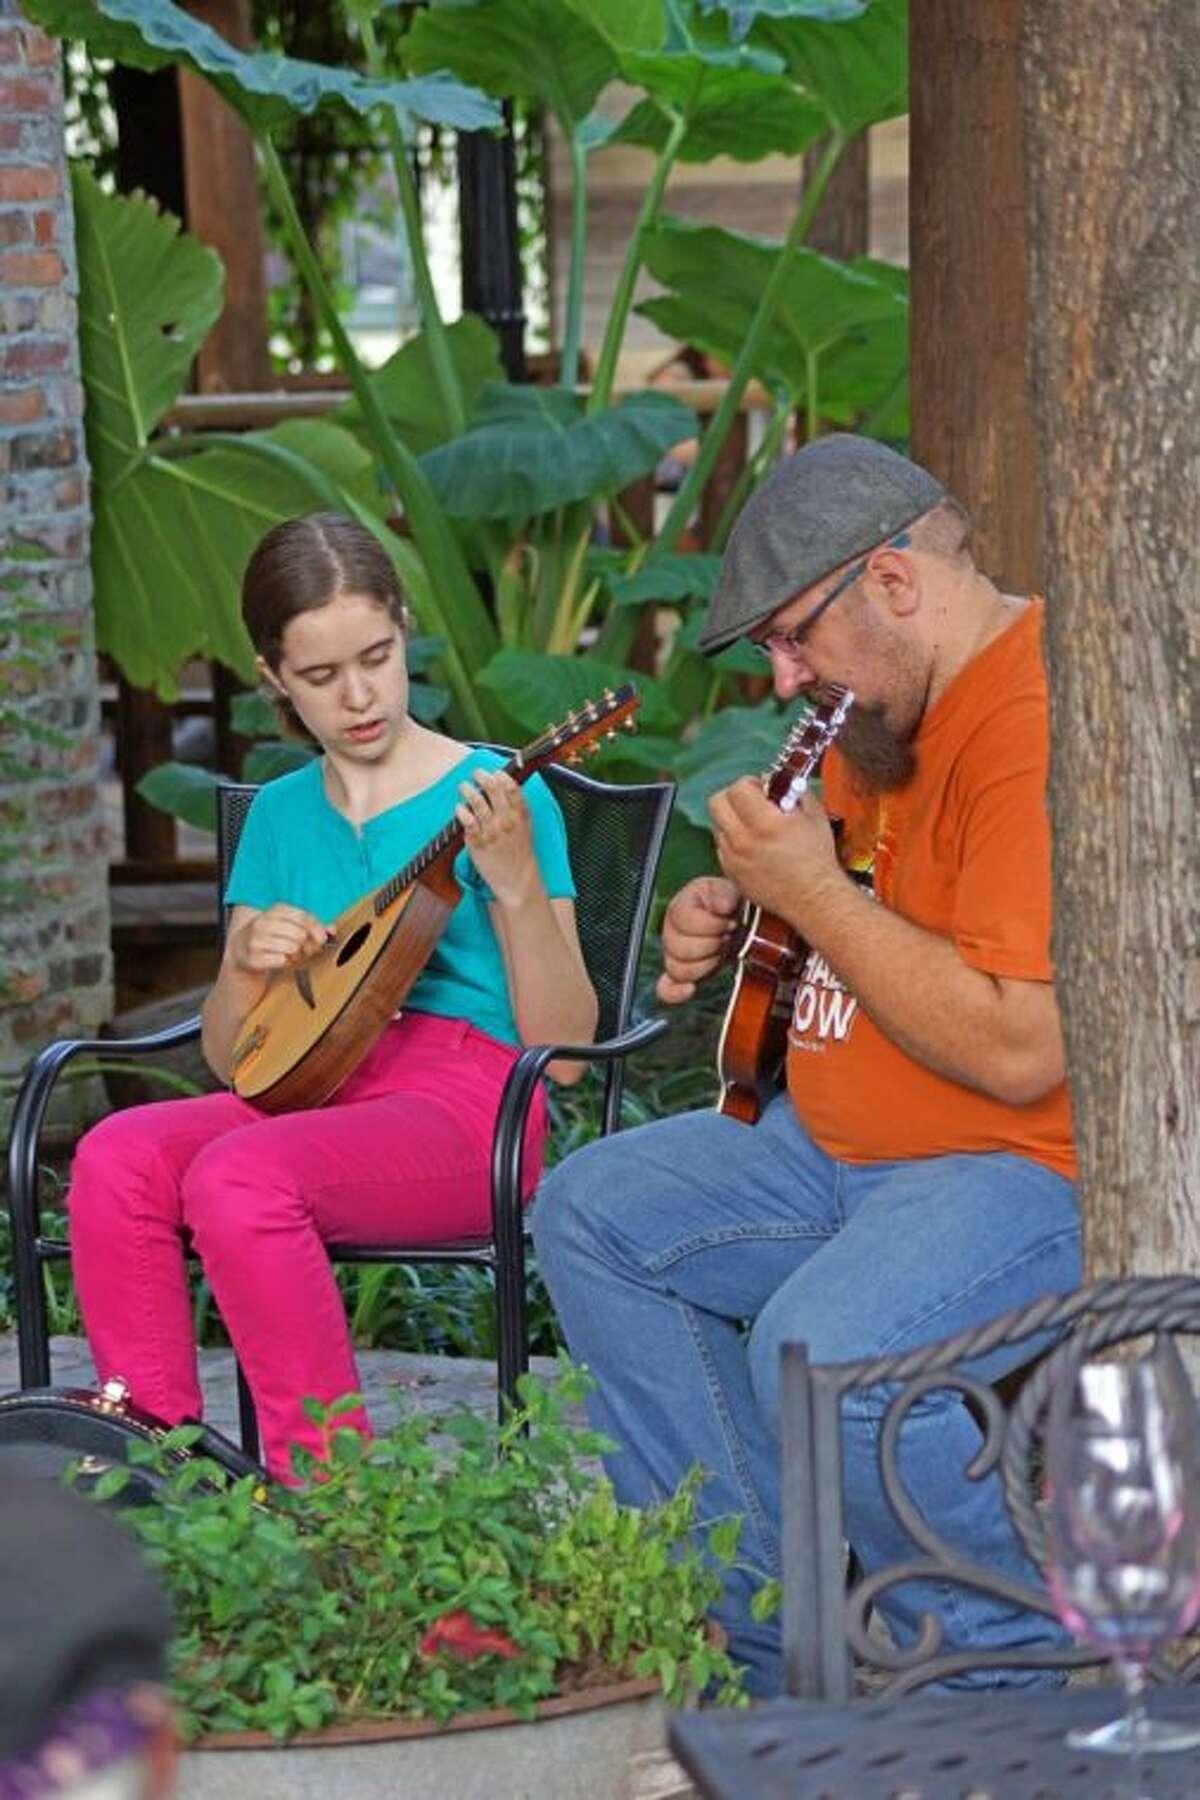 Local Bluegrass musicians take part in